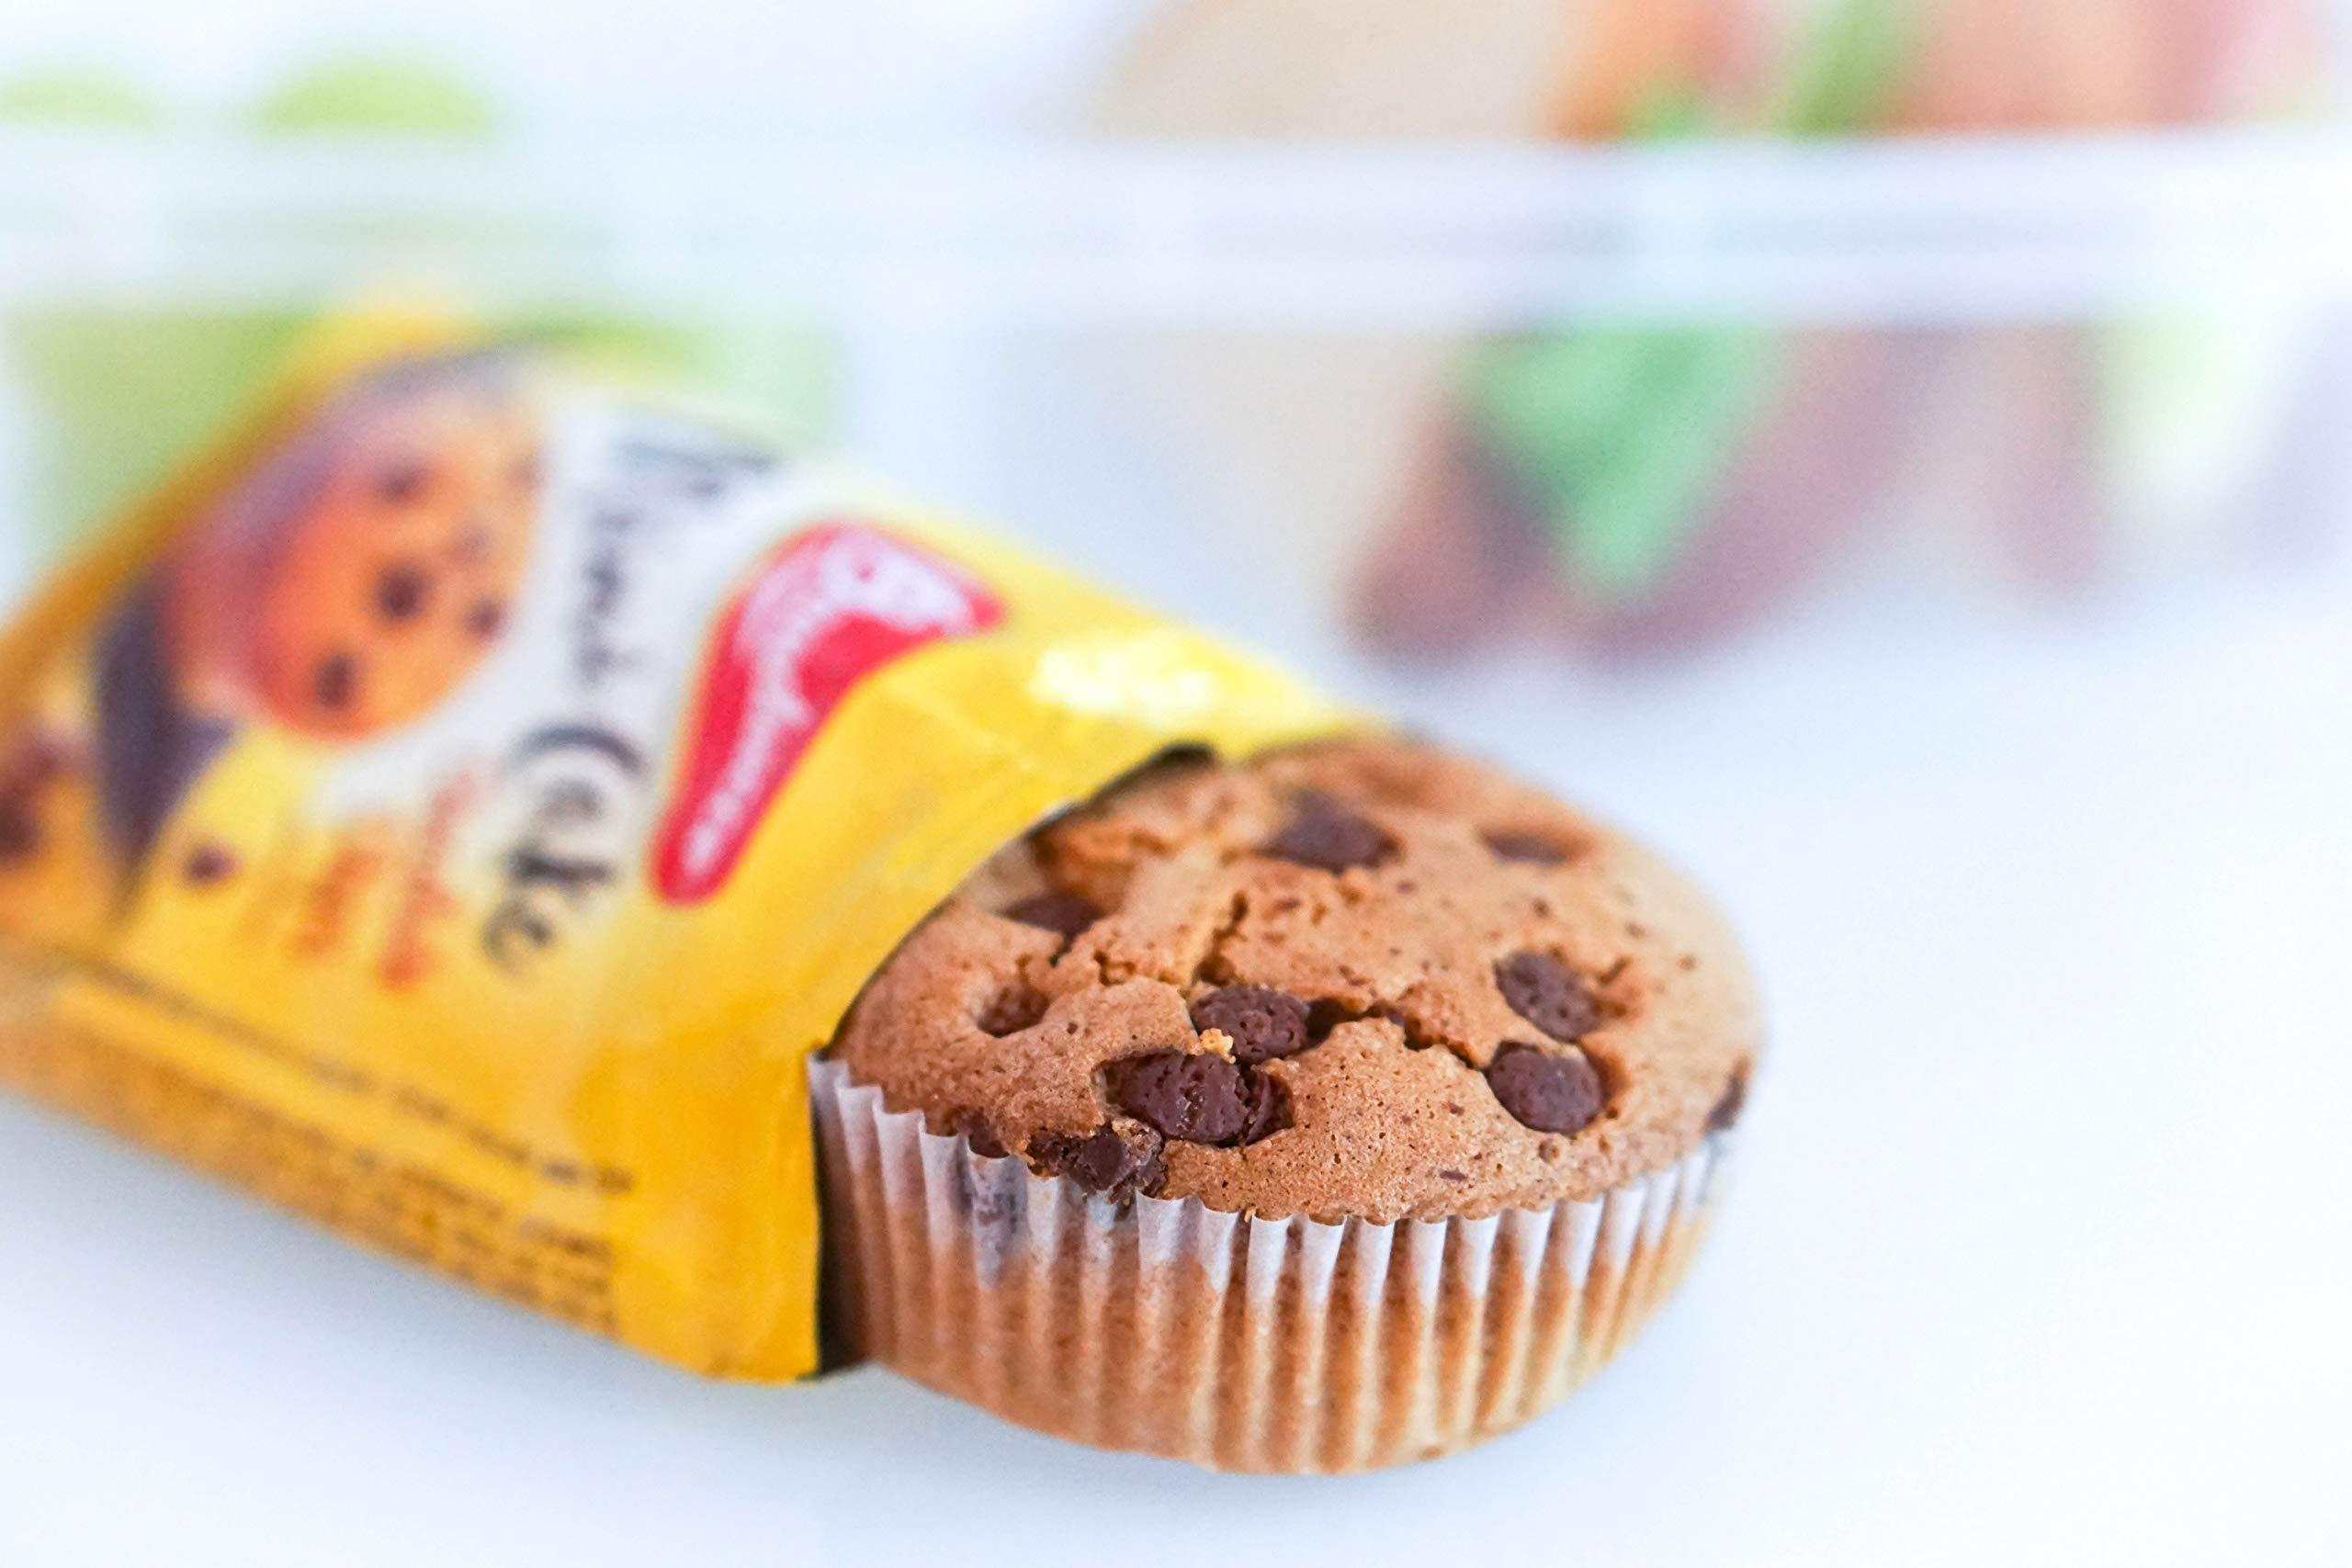 New Bauducco Mini Cakes 12 pack - (6) Chocolate (6) Strawberry, 15.88 oz